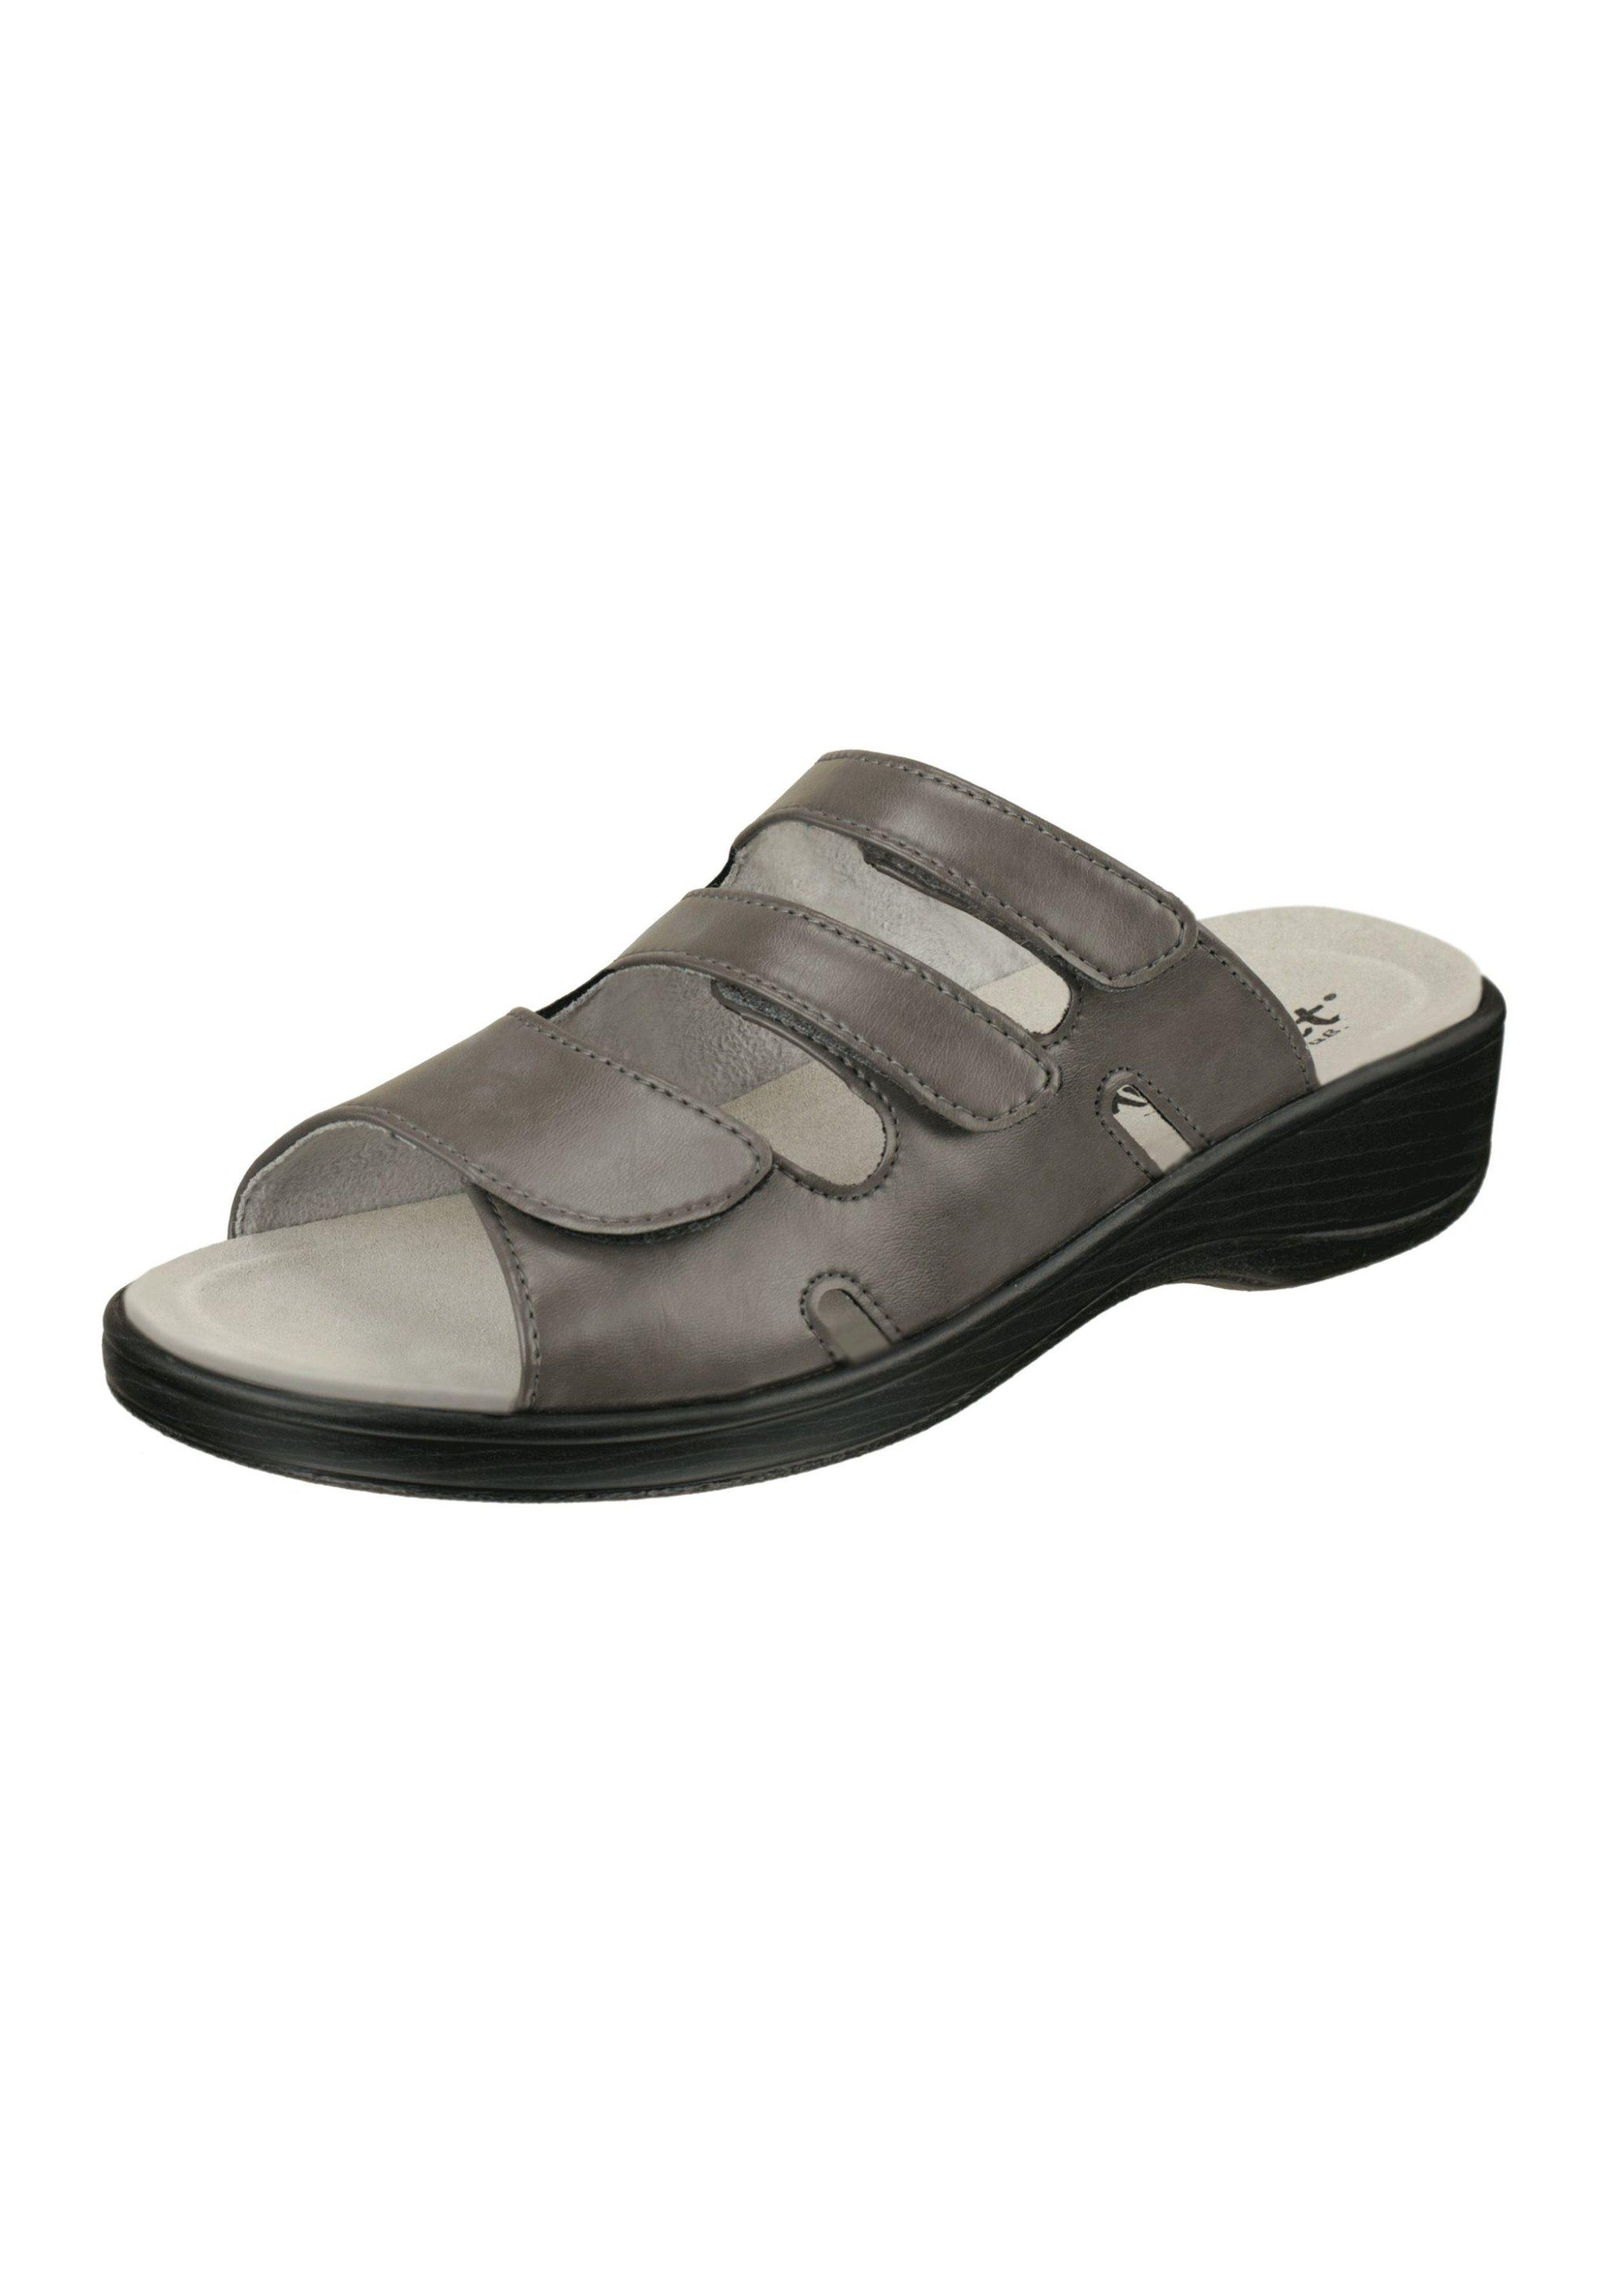 KaufenOtto Online »cornelia« Feet Natural Sandale n0OPwk8